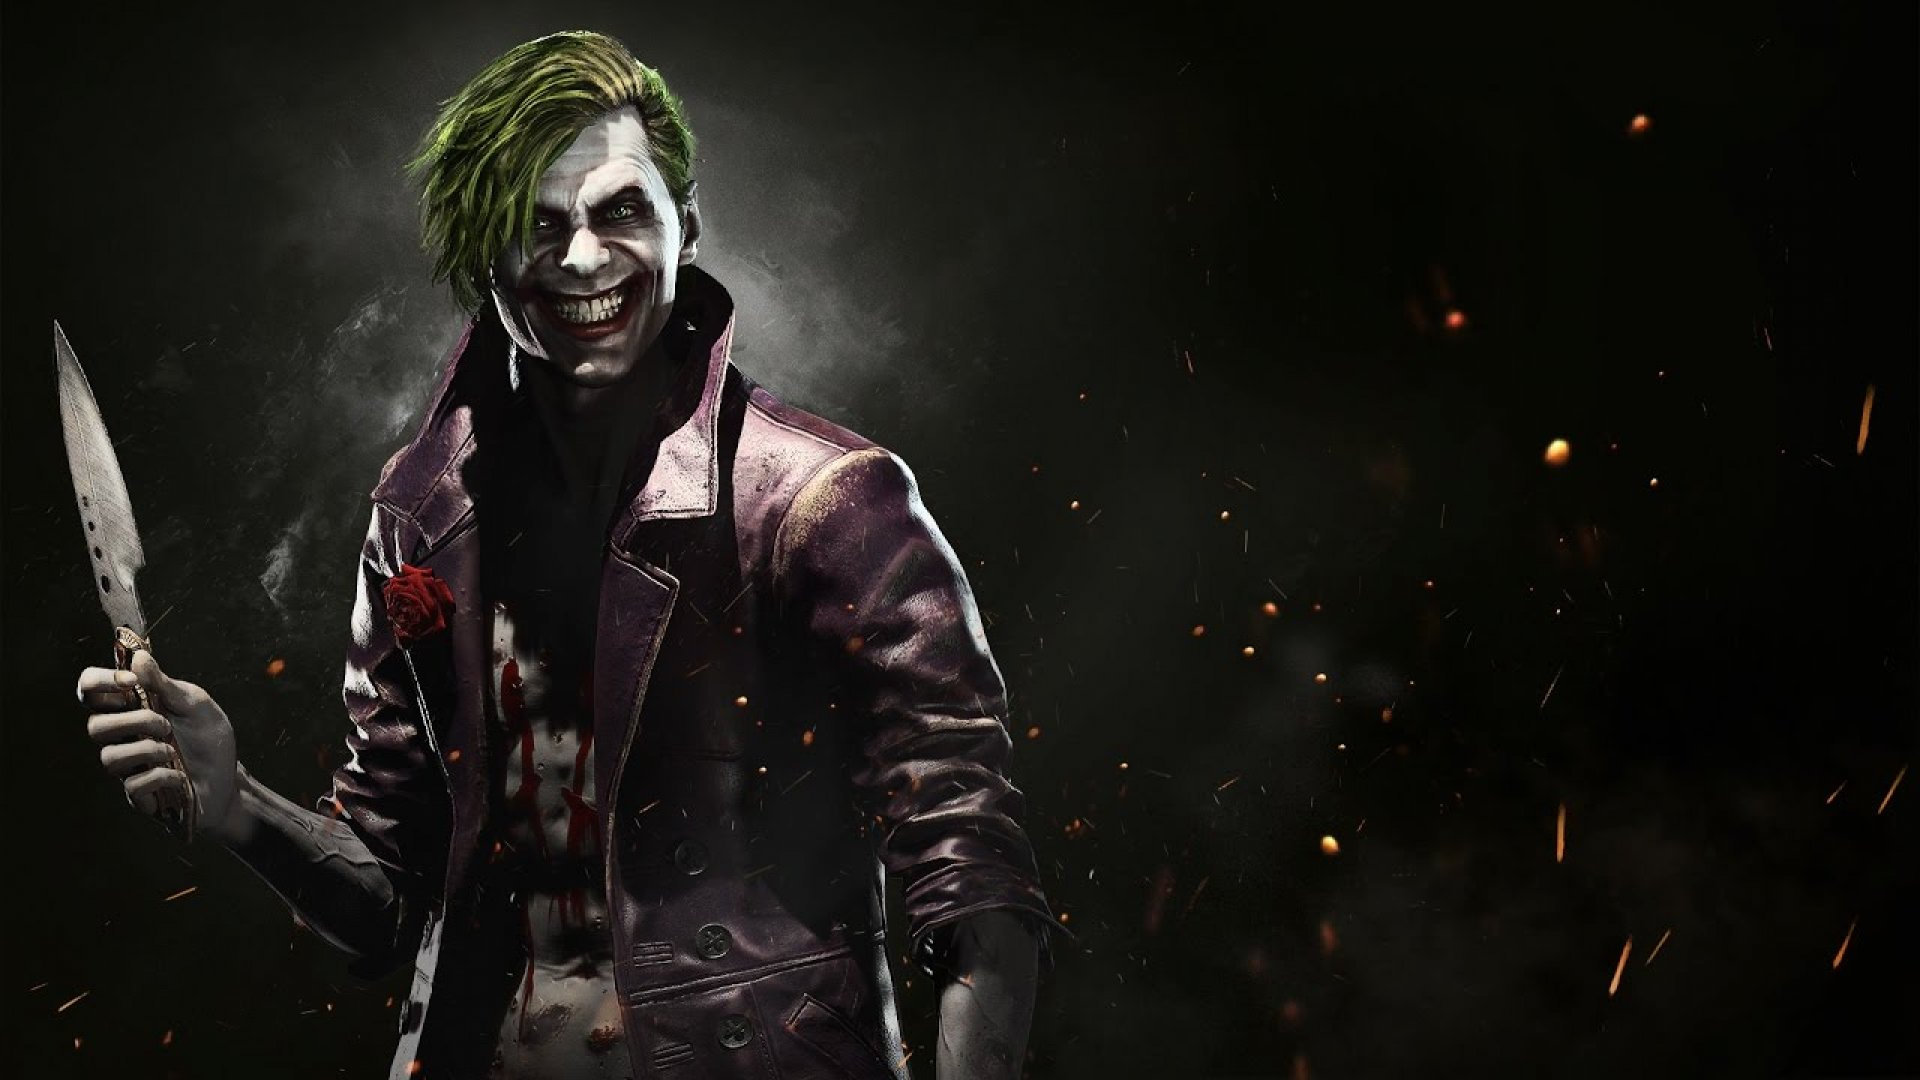 Download Wallpaper Macbook Joker - joker-injustice-2-to  Perfect Image Reference_632974.jpg